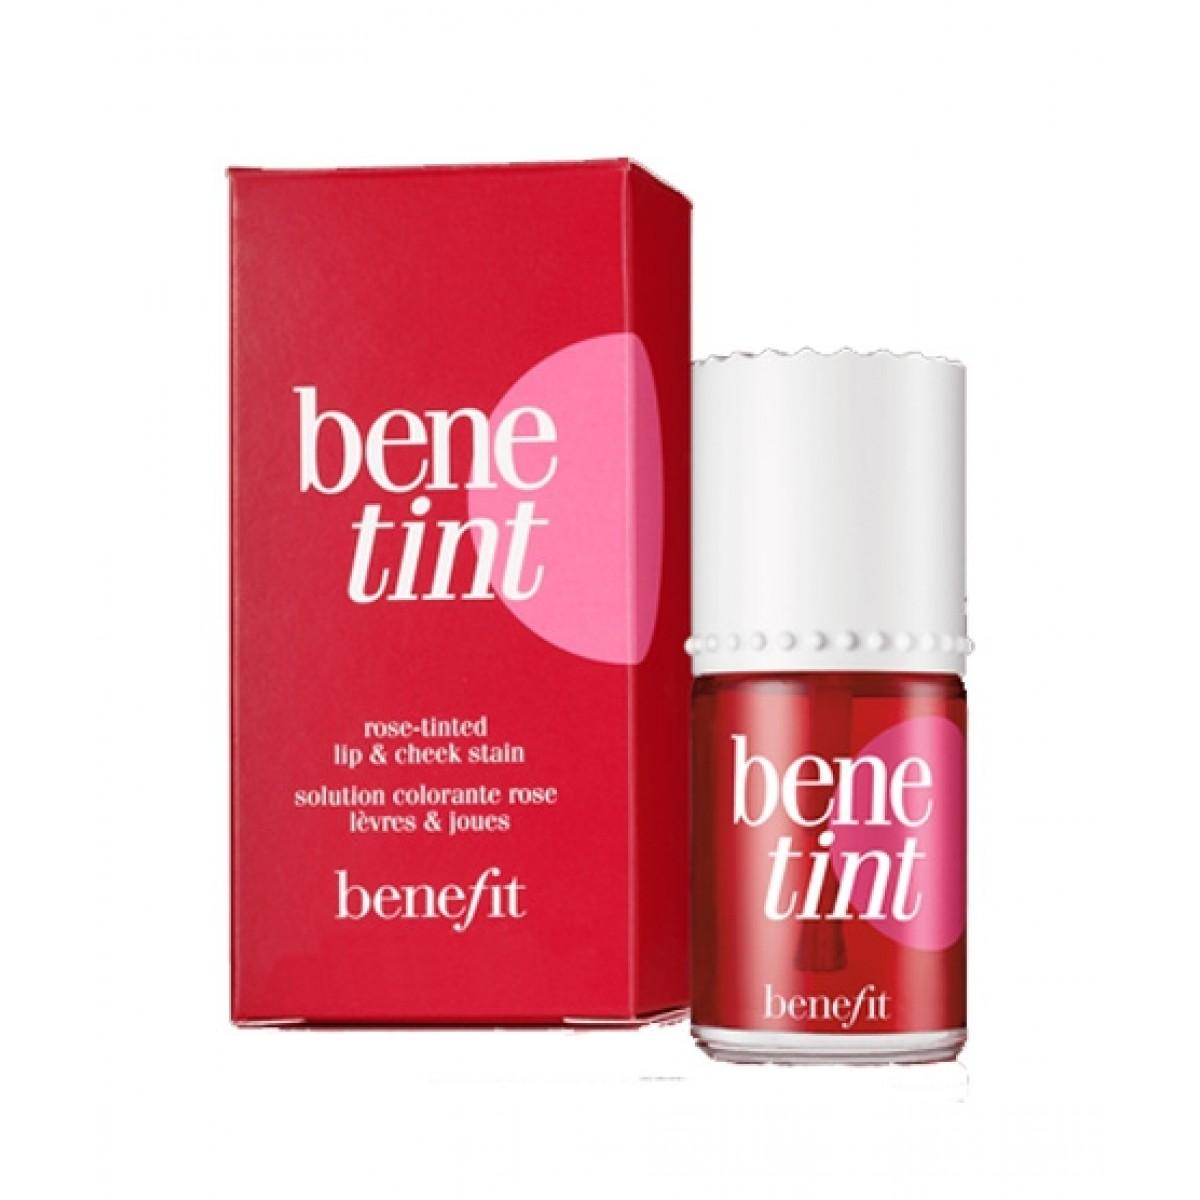 Bene Tint Lip & Cheek Stain Rose Red Cheeks & Lip Tint Long Lasting Rose Tinted